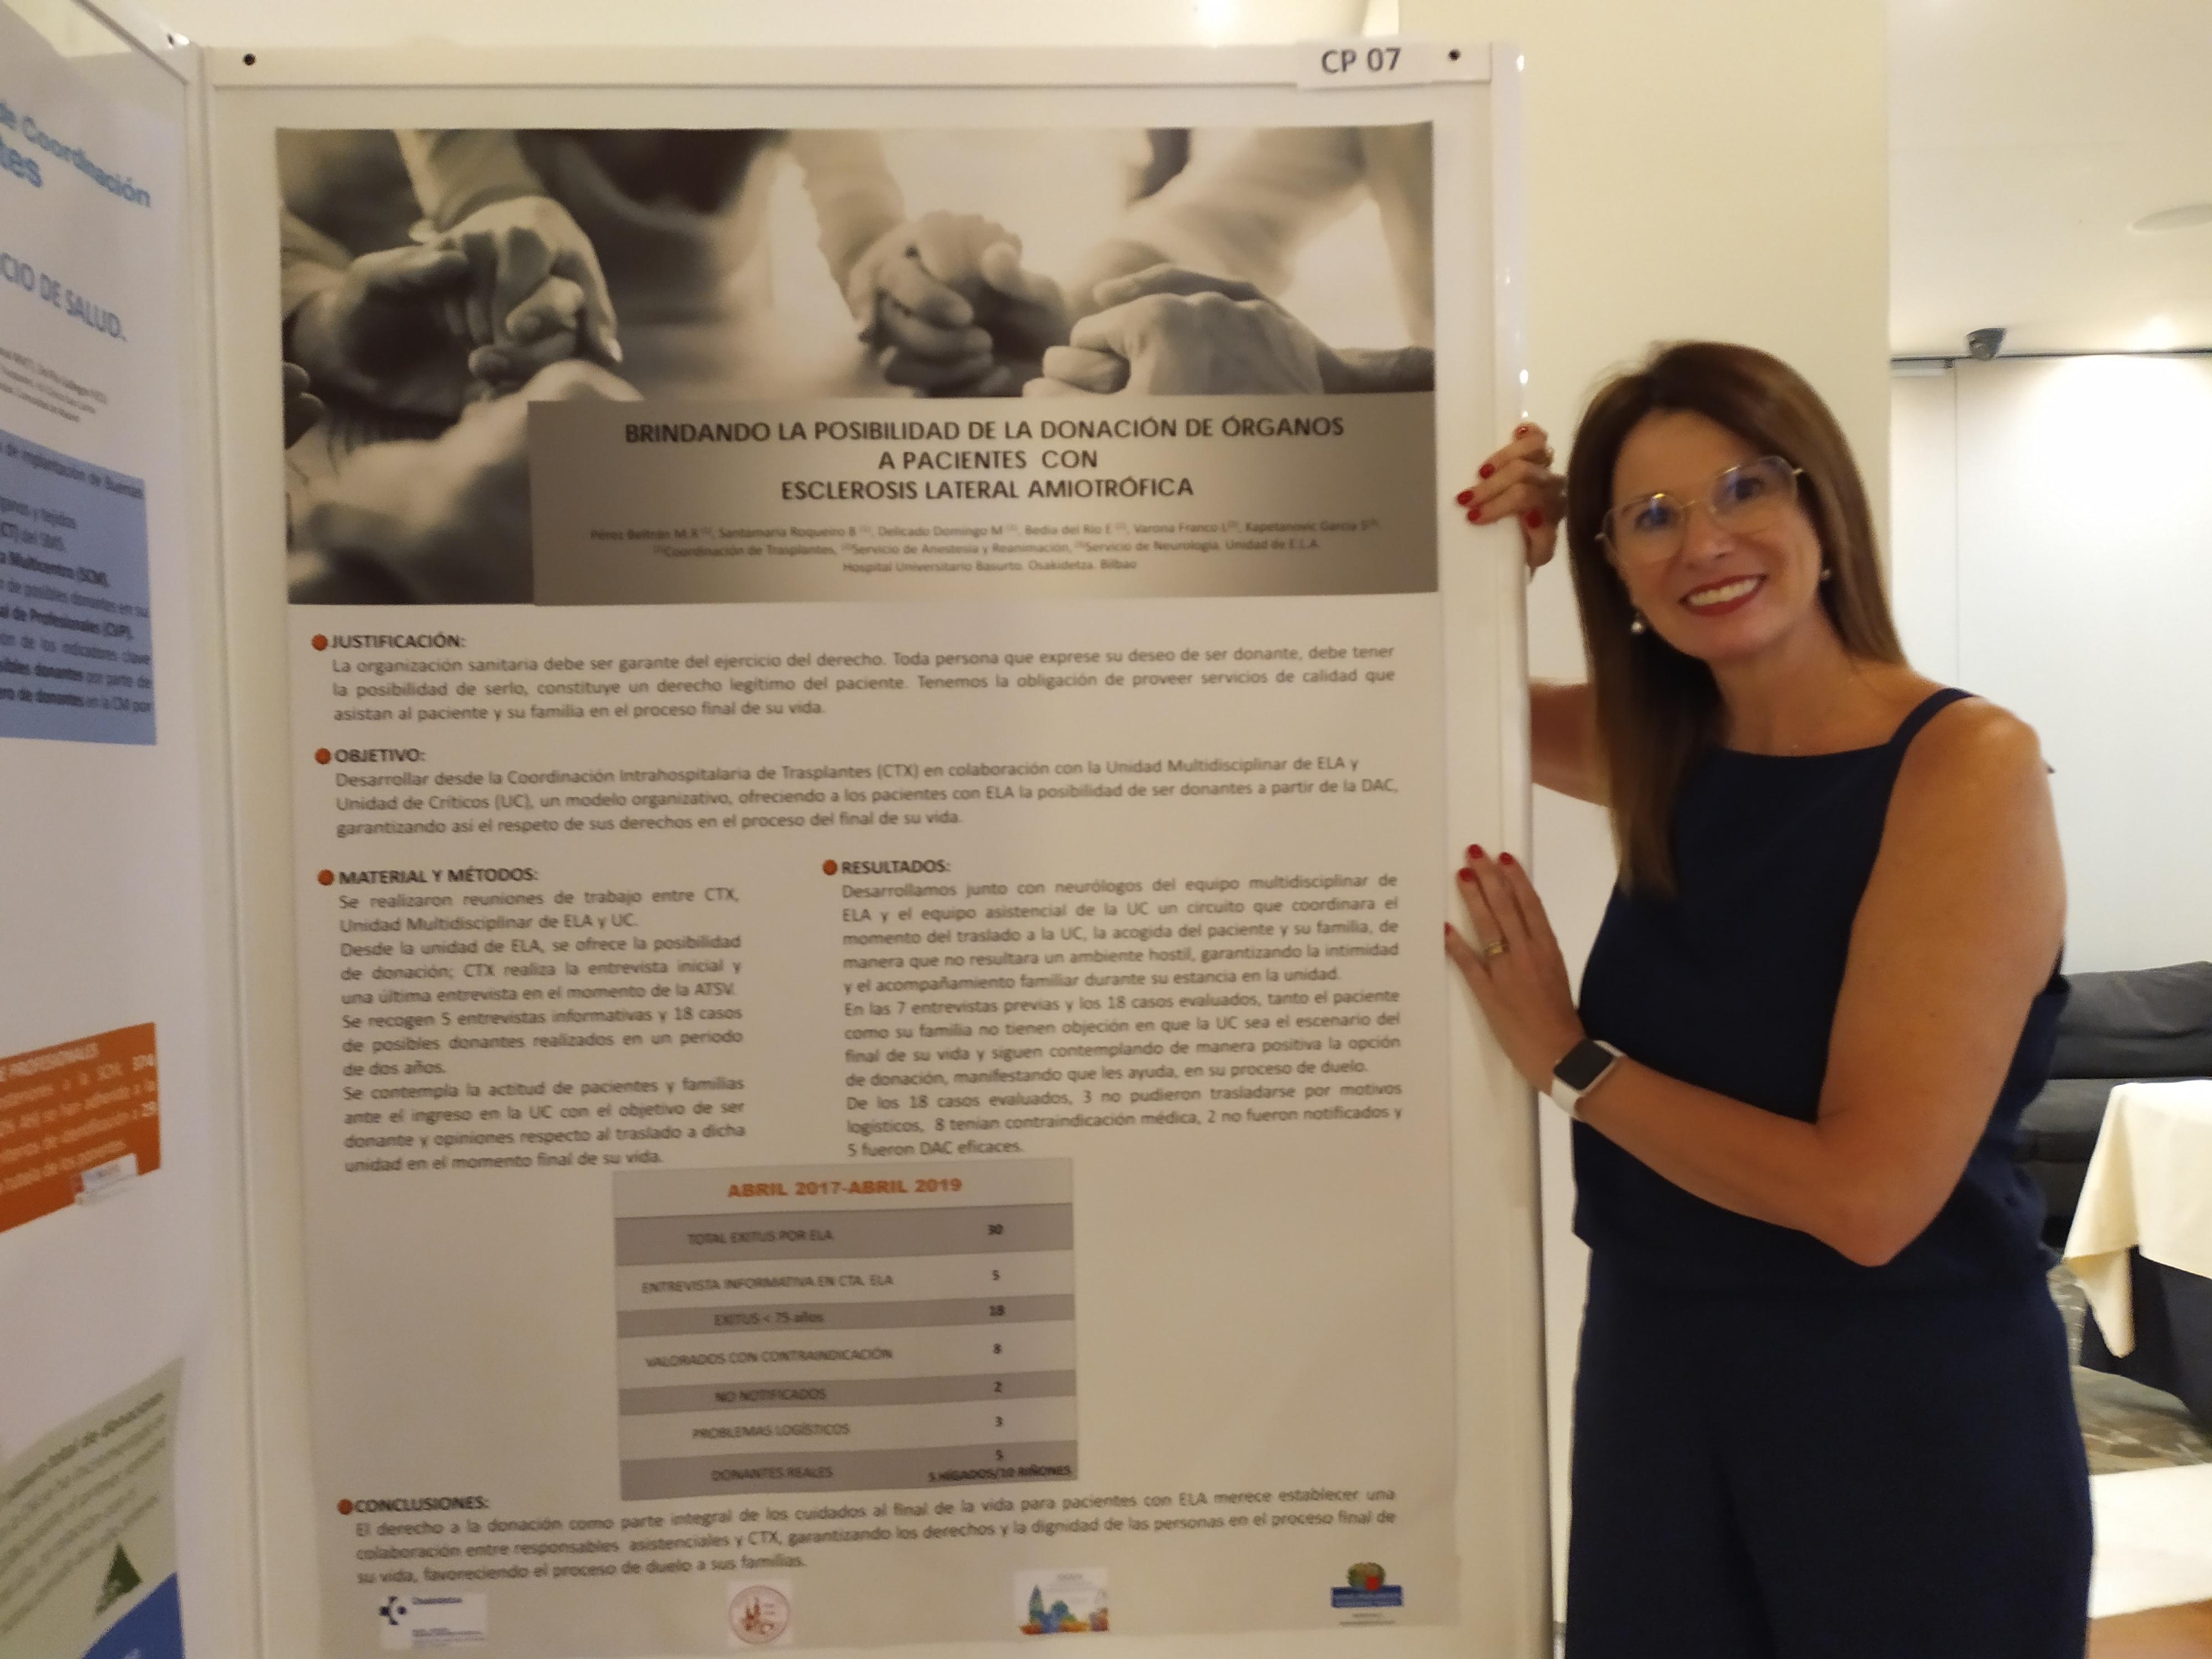 Rosario Pérez Beltrán, del hospital de Basurto (Bilbao)